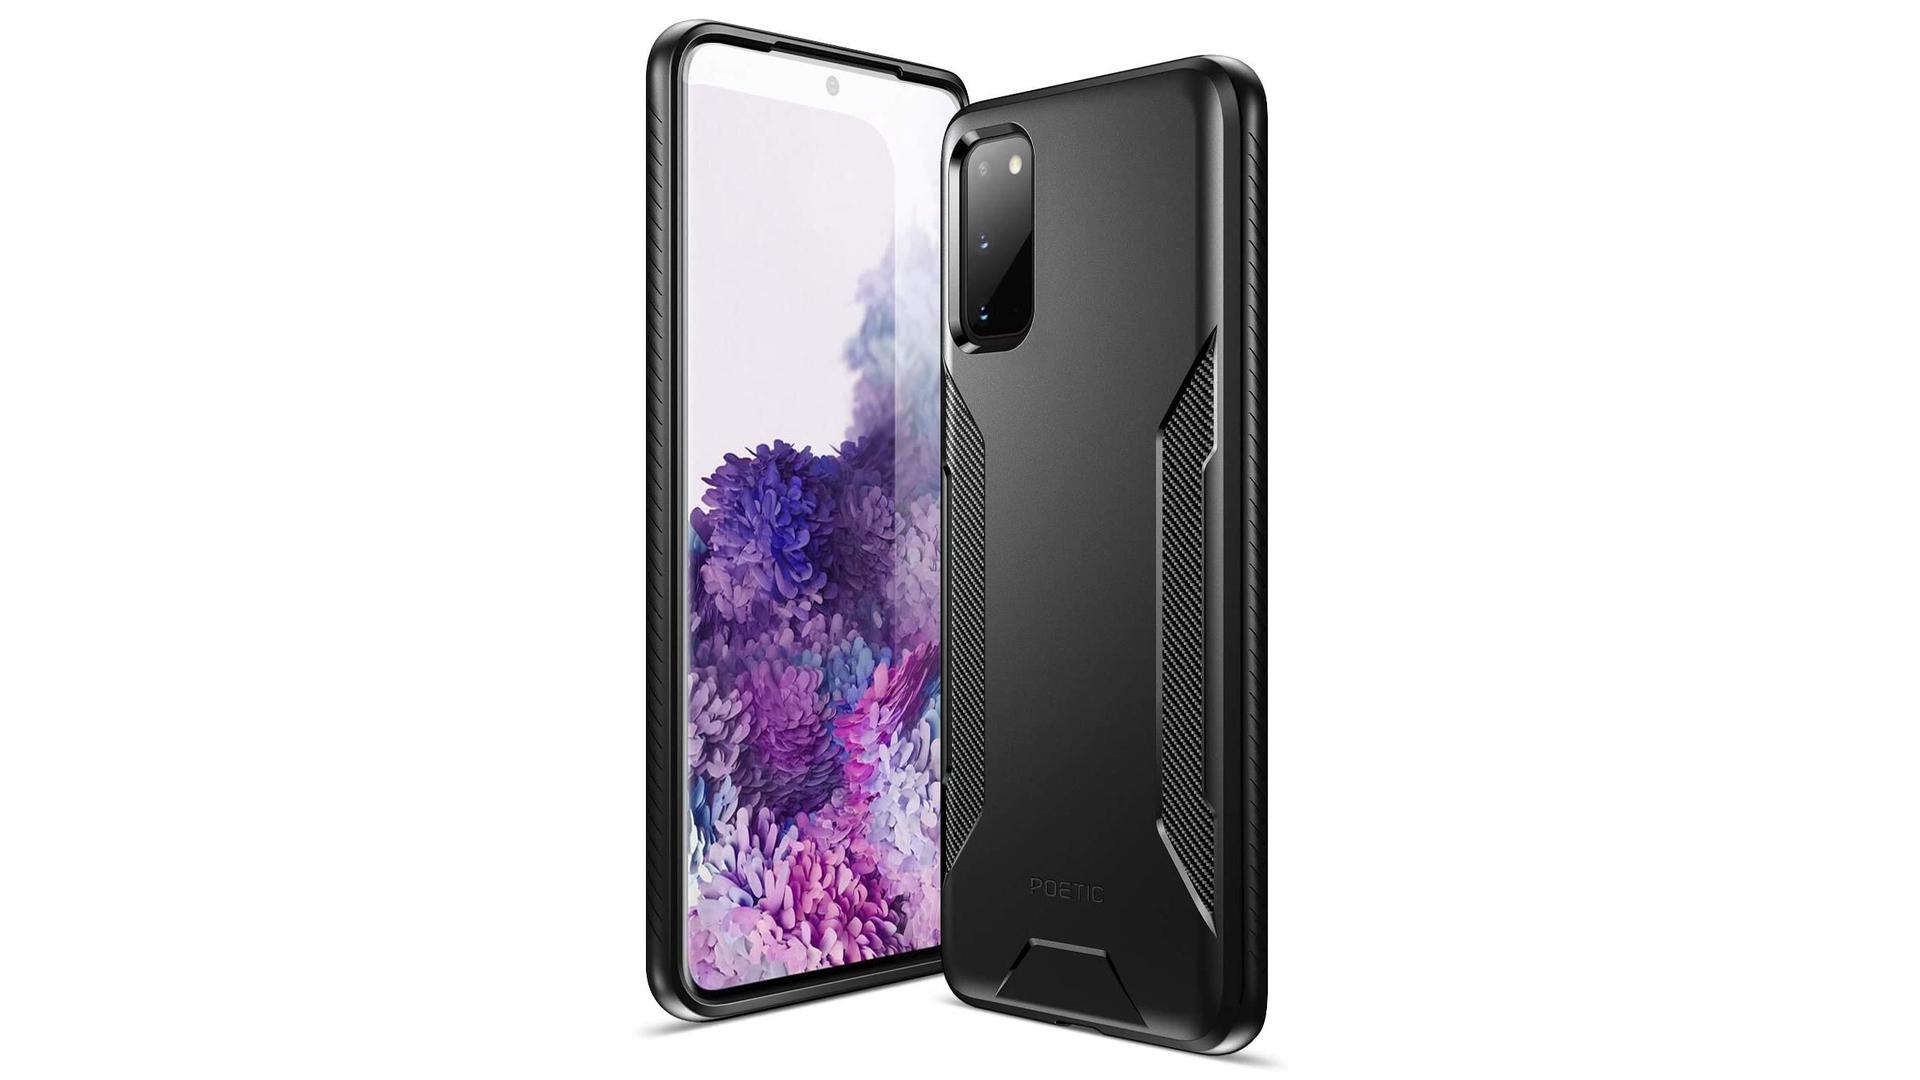 Poetic Karbon Shield Samsung Galaxy S20 case